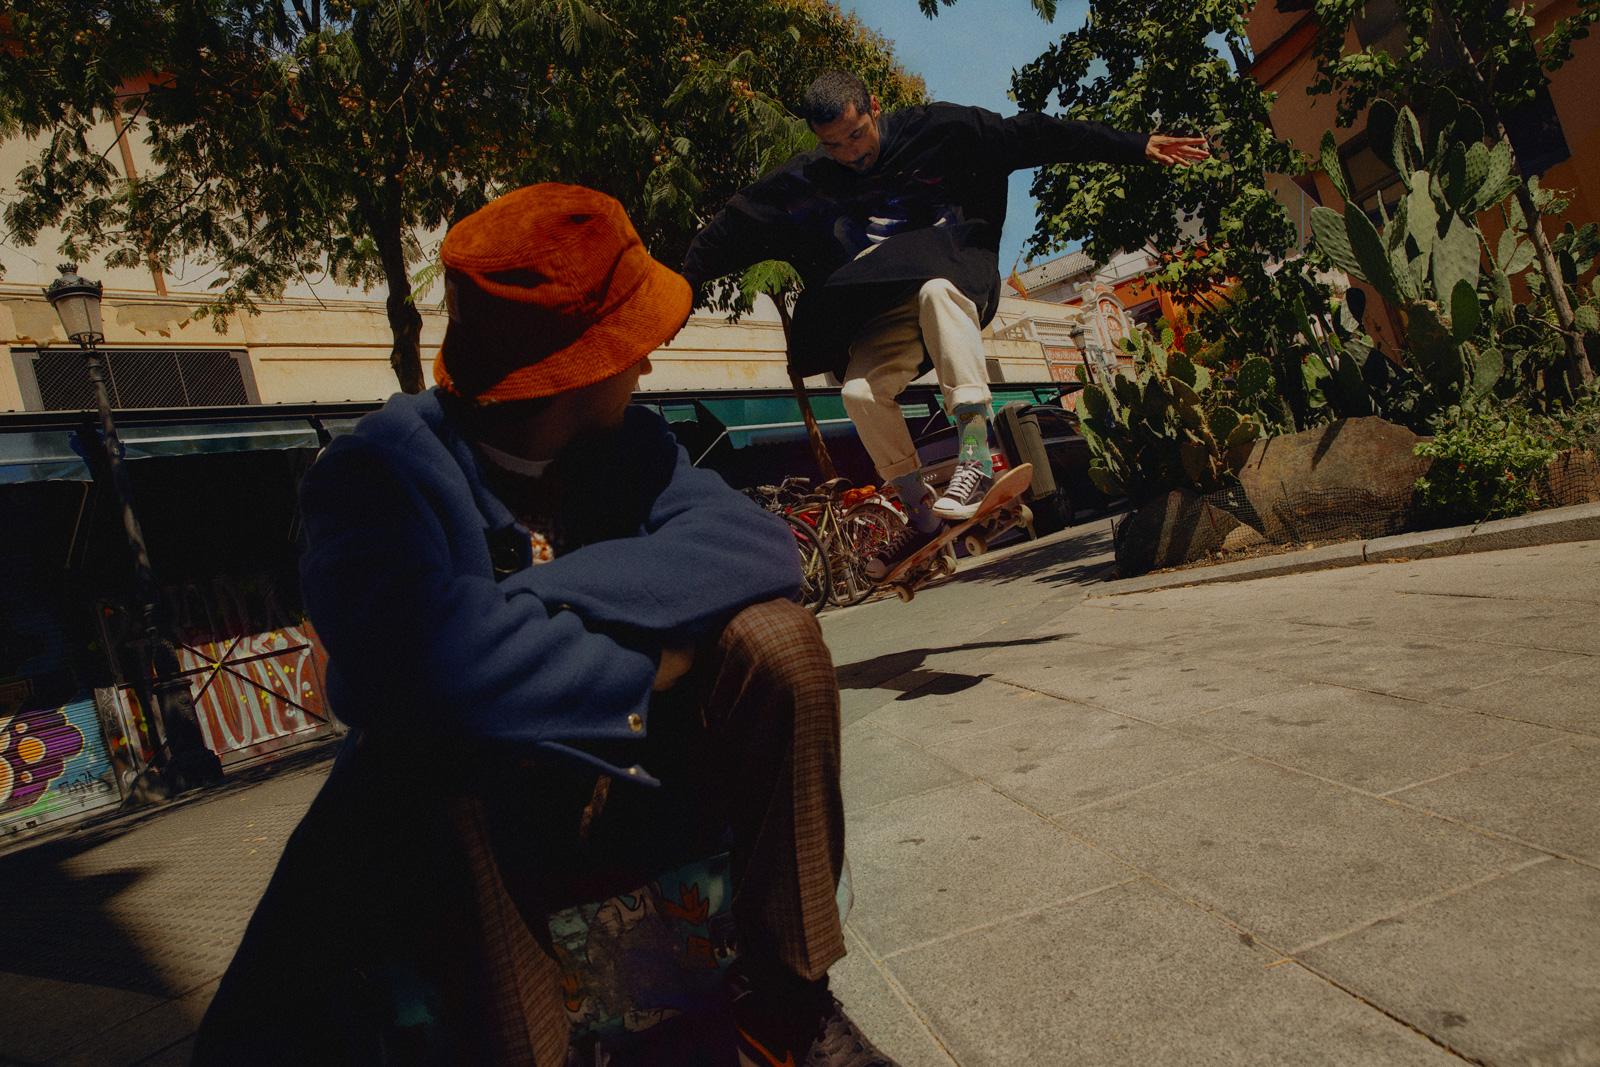 Pablo Curto Skate